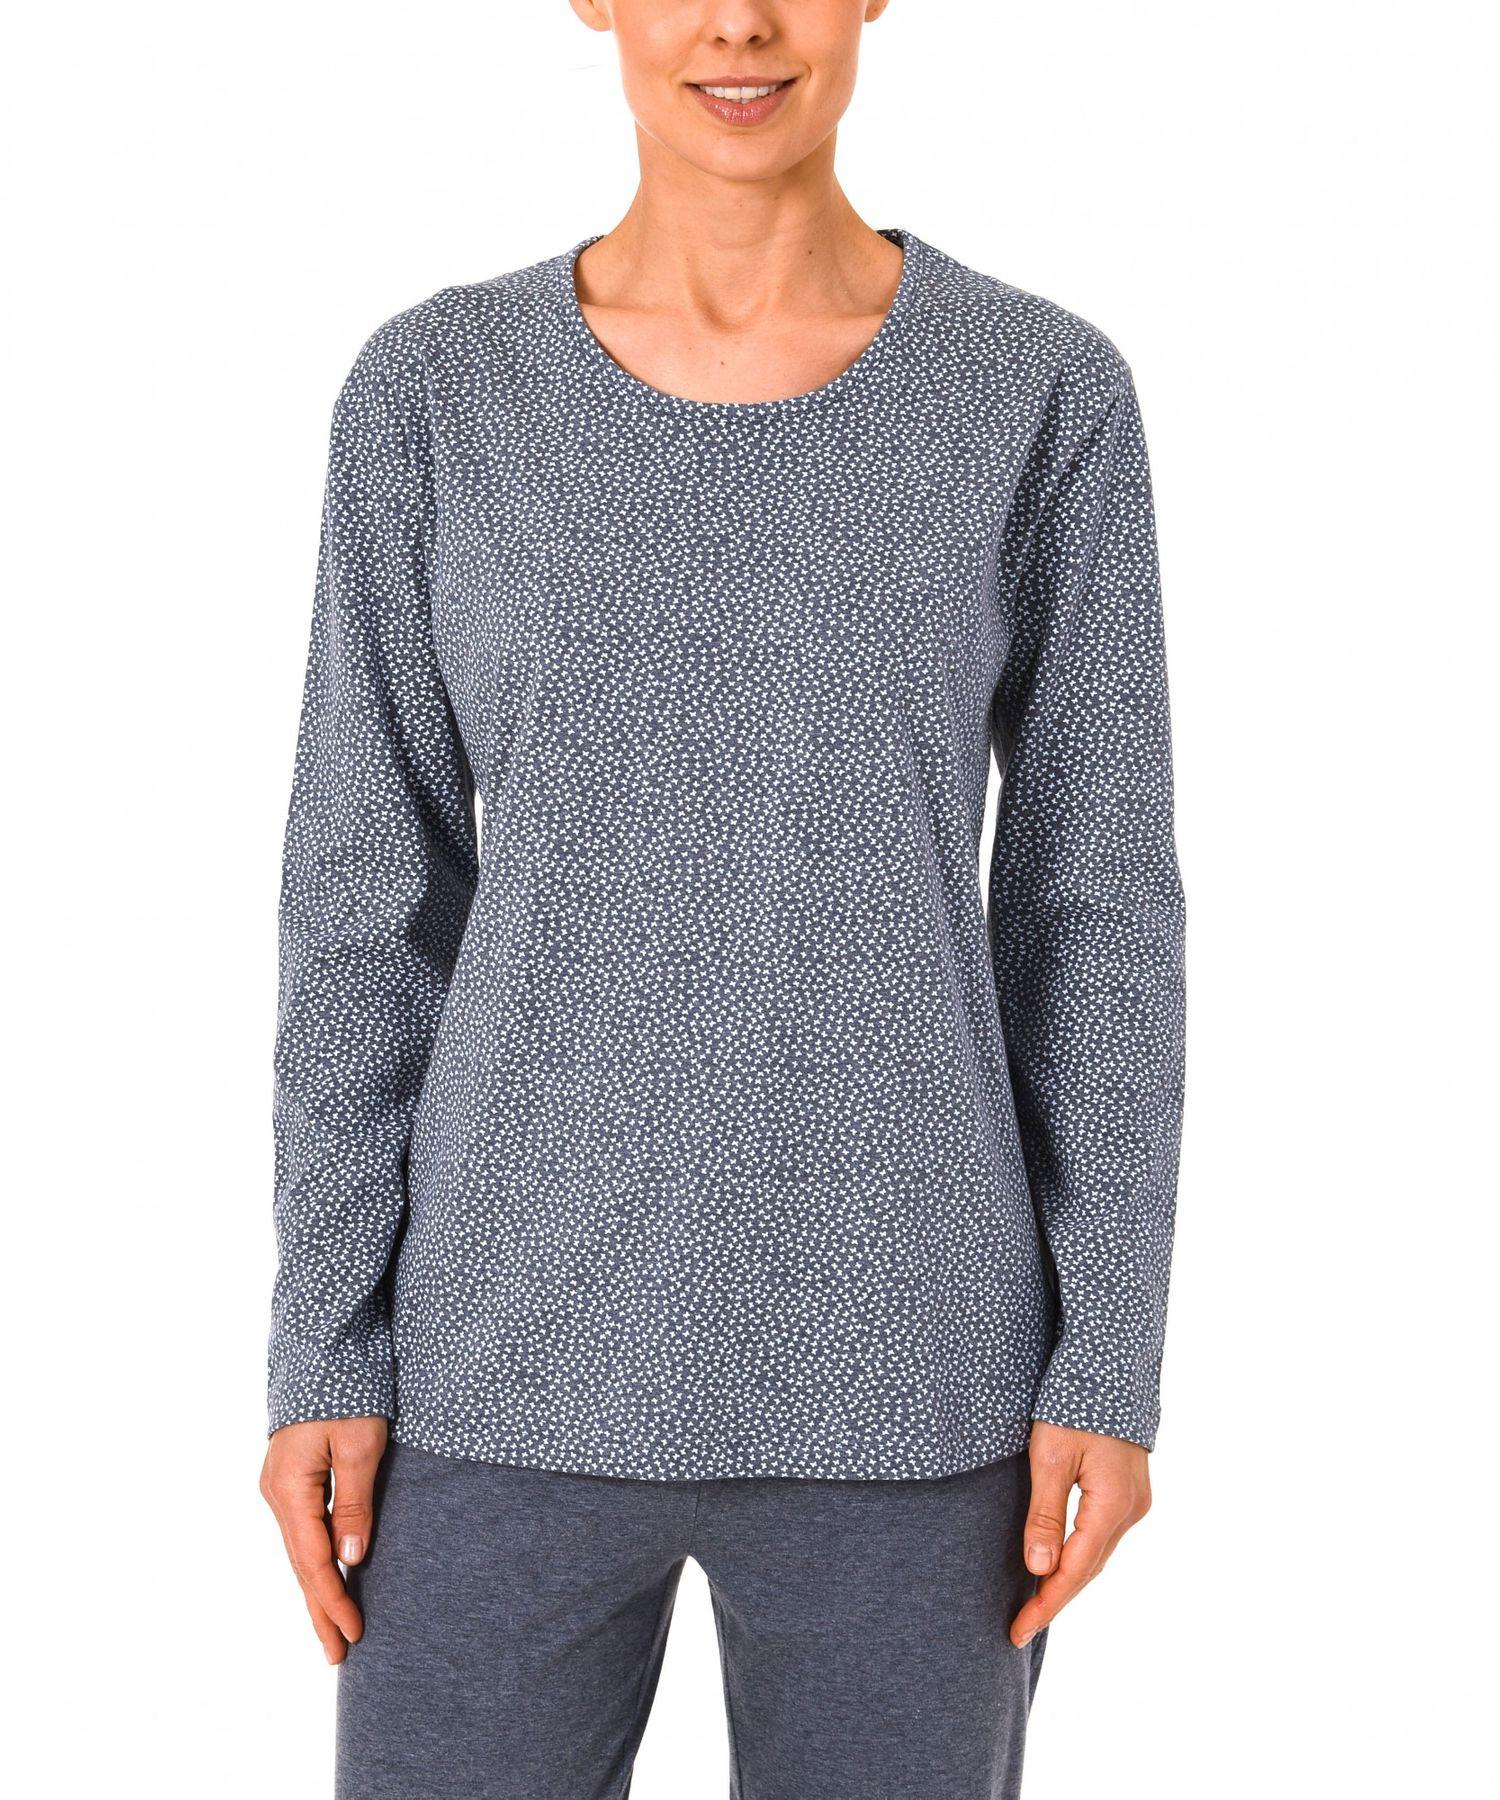 Damen Shirt  Oberteil - langarm Mix & Match Minimalprint – 171 219 90 904 – Bild 2